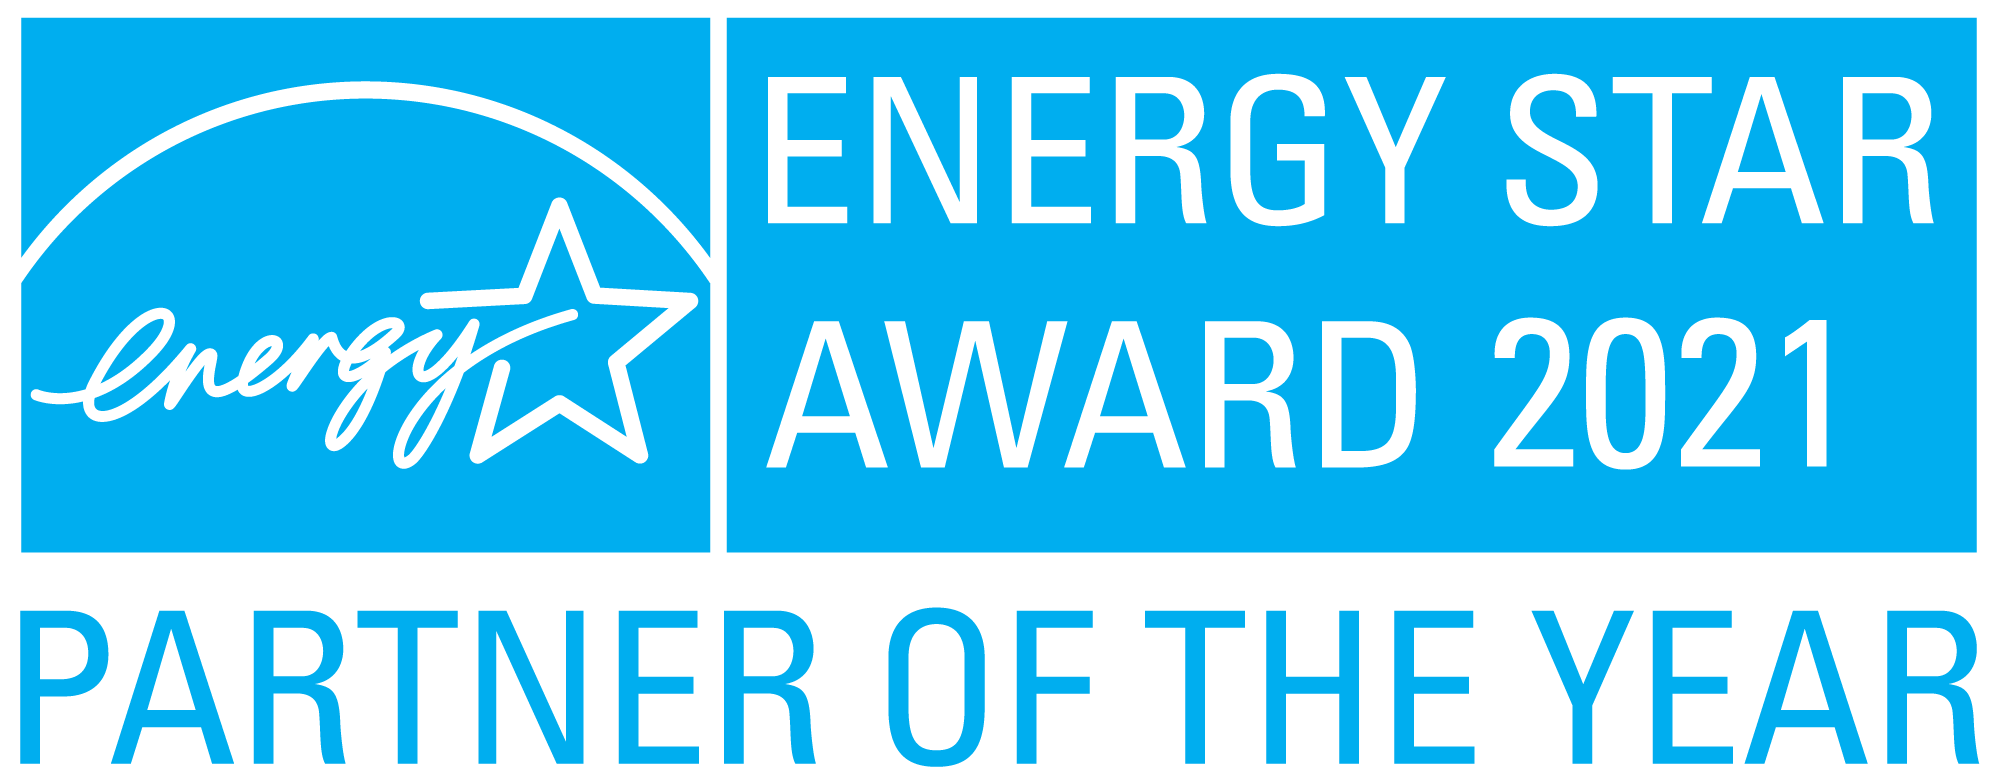 ENERGY STAR Partner of the Year 2021 Logo